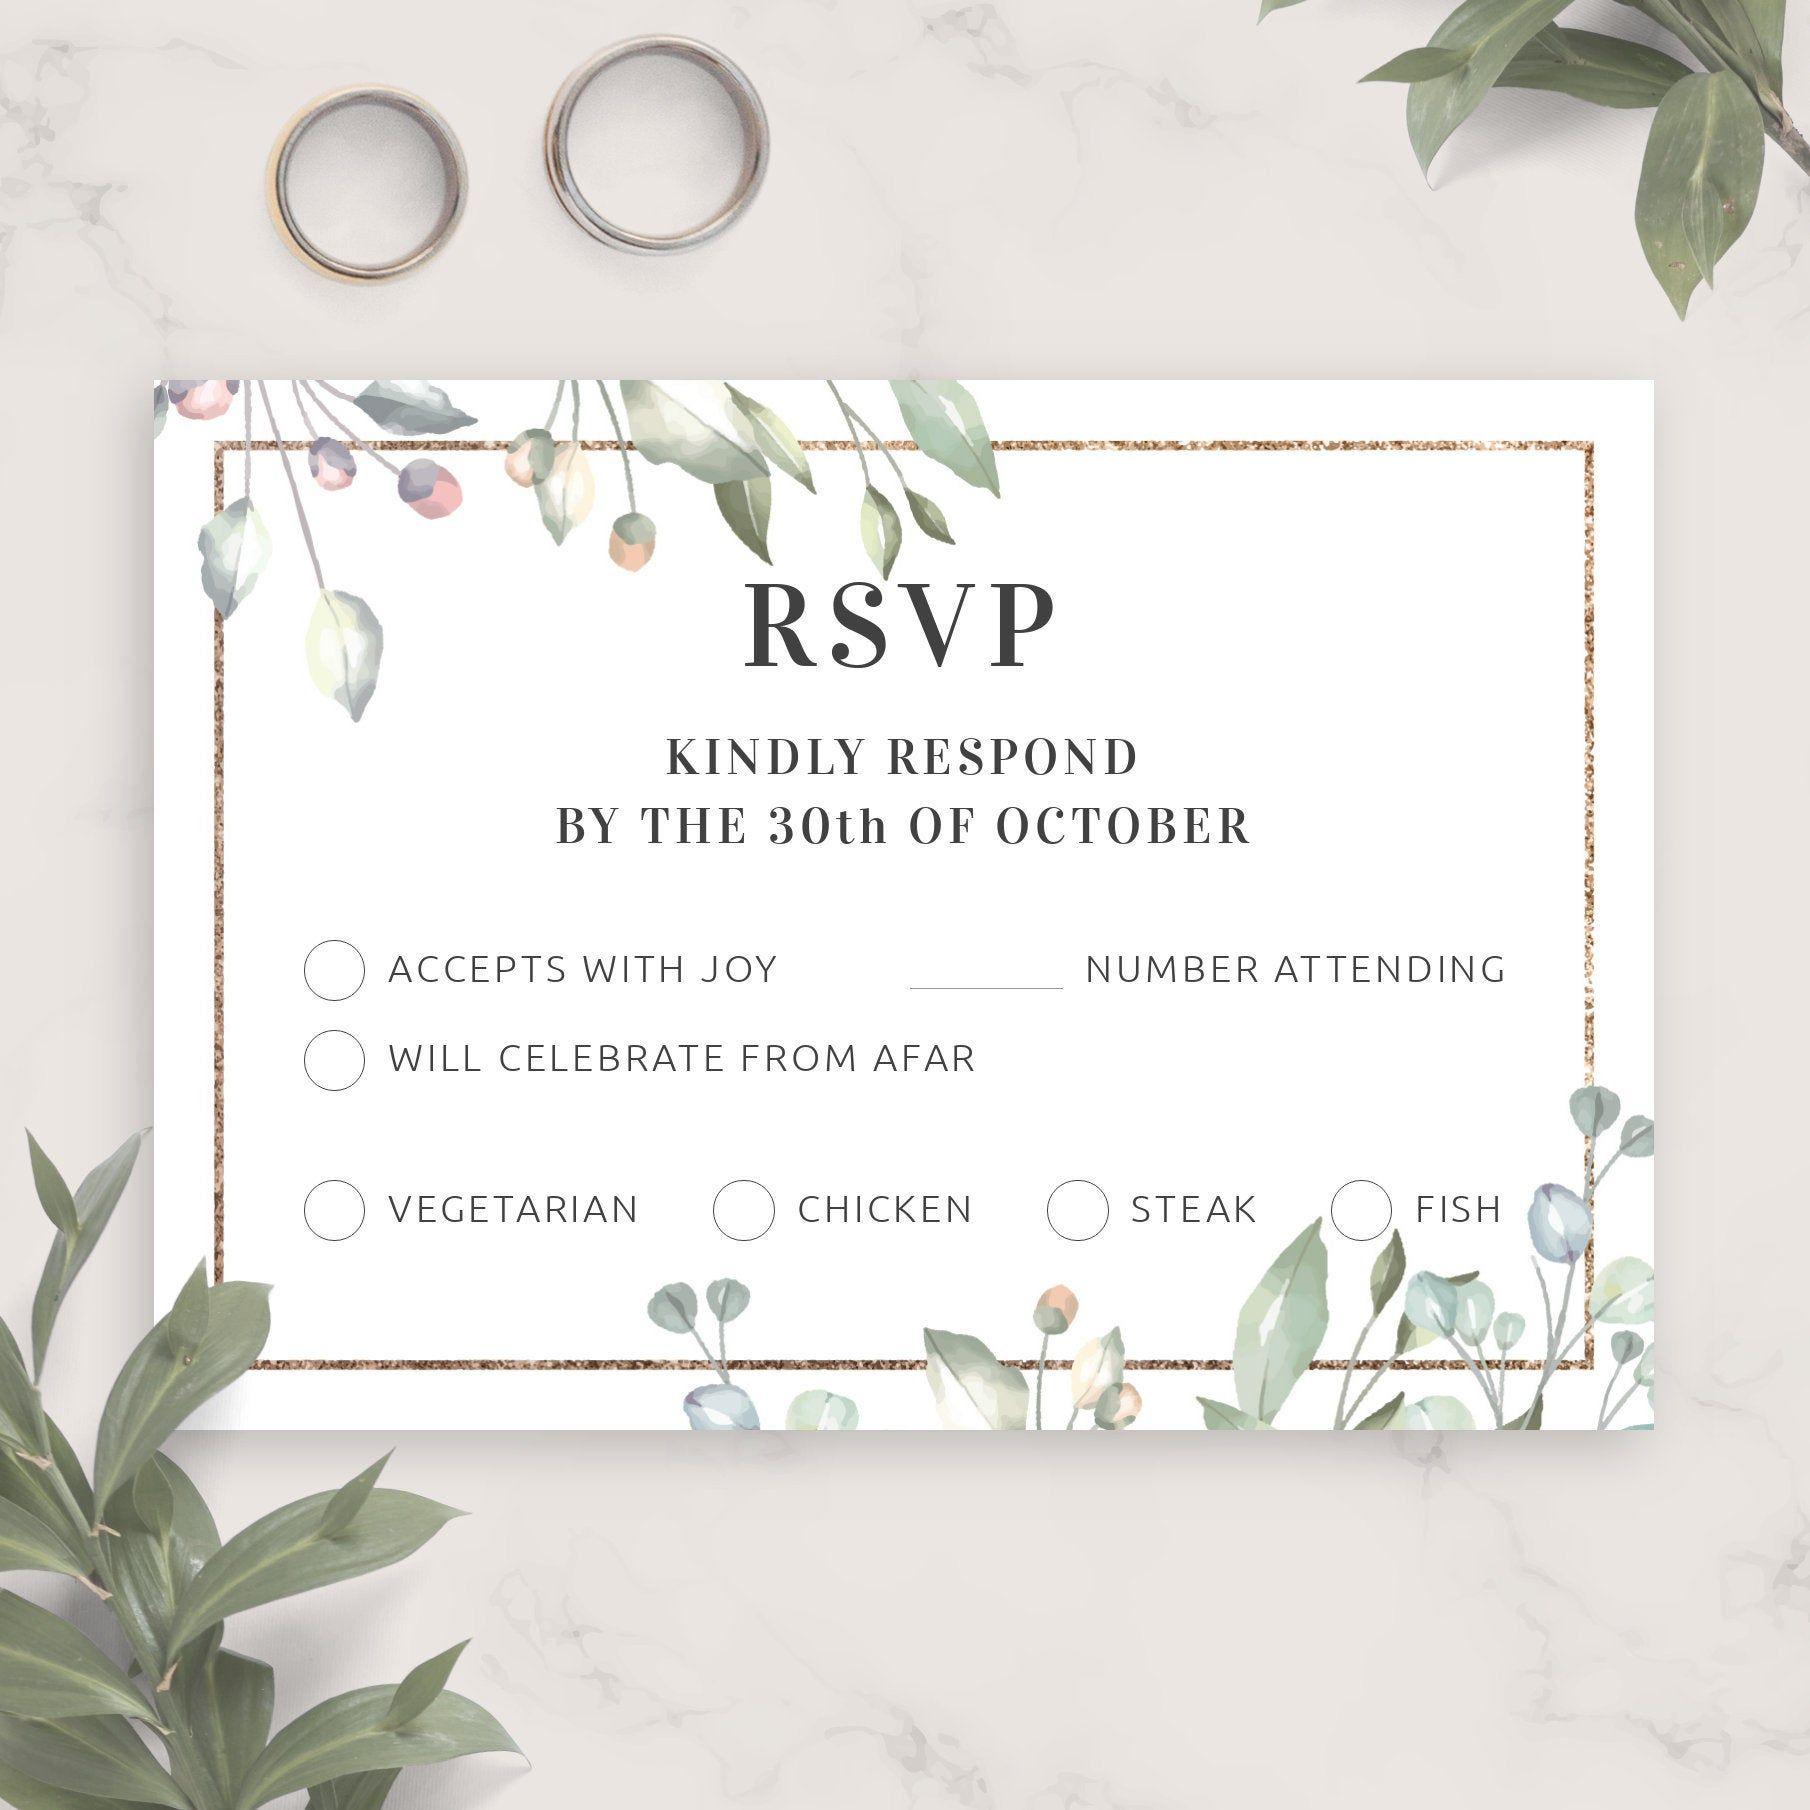 Floral Elegant Wedding Rsvp Card Template Printable Wedding Rsvp Postcard Editable Response Card Kindly Reply Pdf Jpg Png In 2020 Rsvp Wedding Cards Wedding Rsvp Postcard Wedding Rsvp